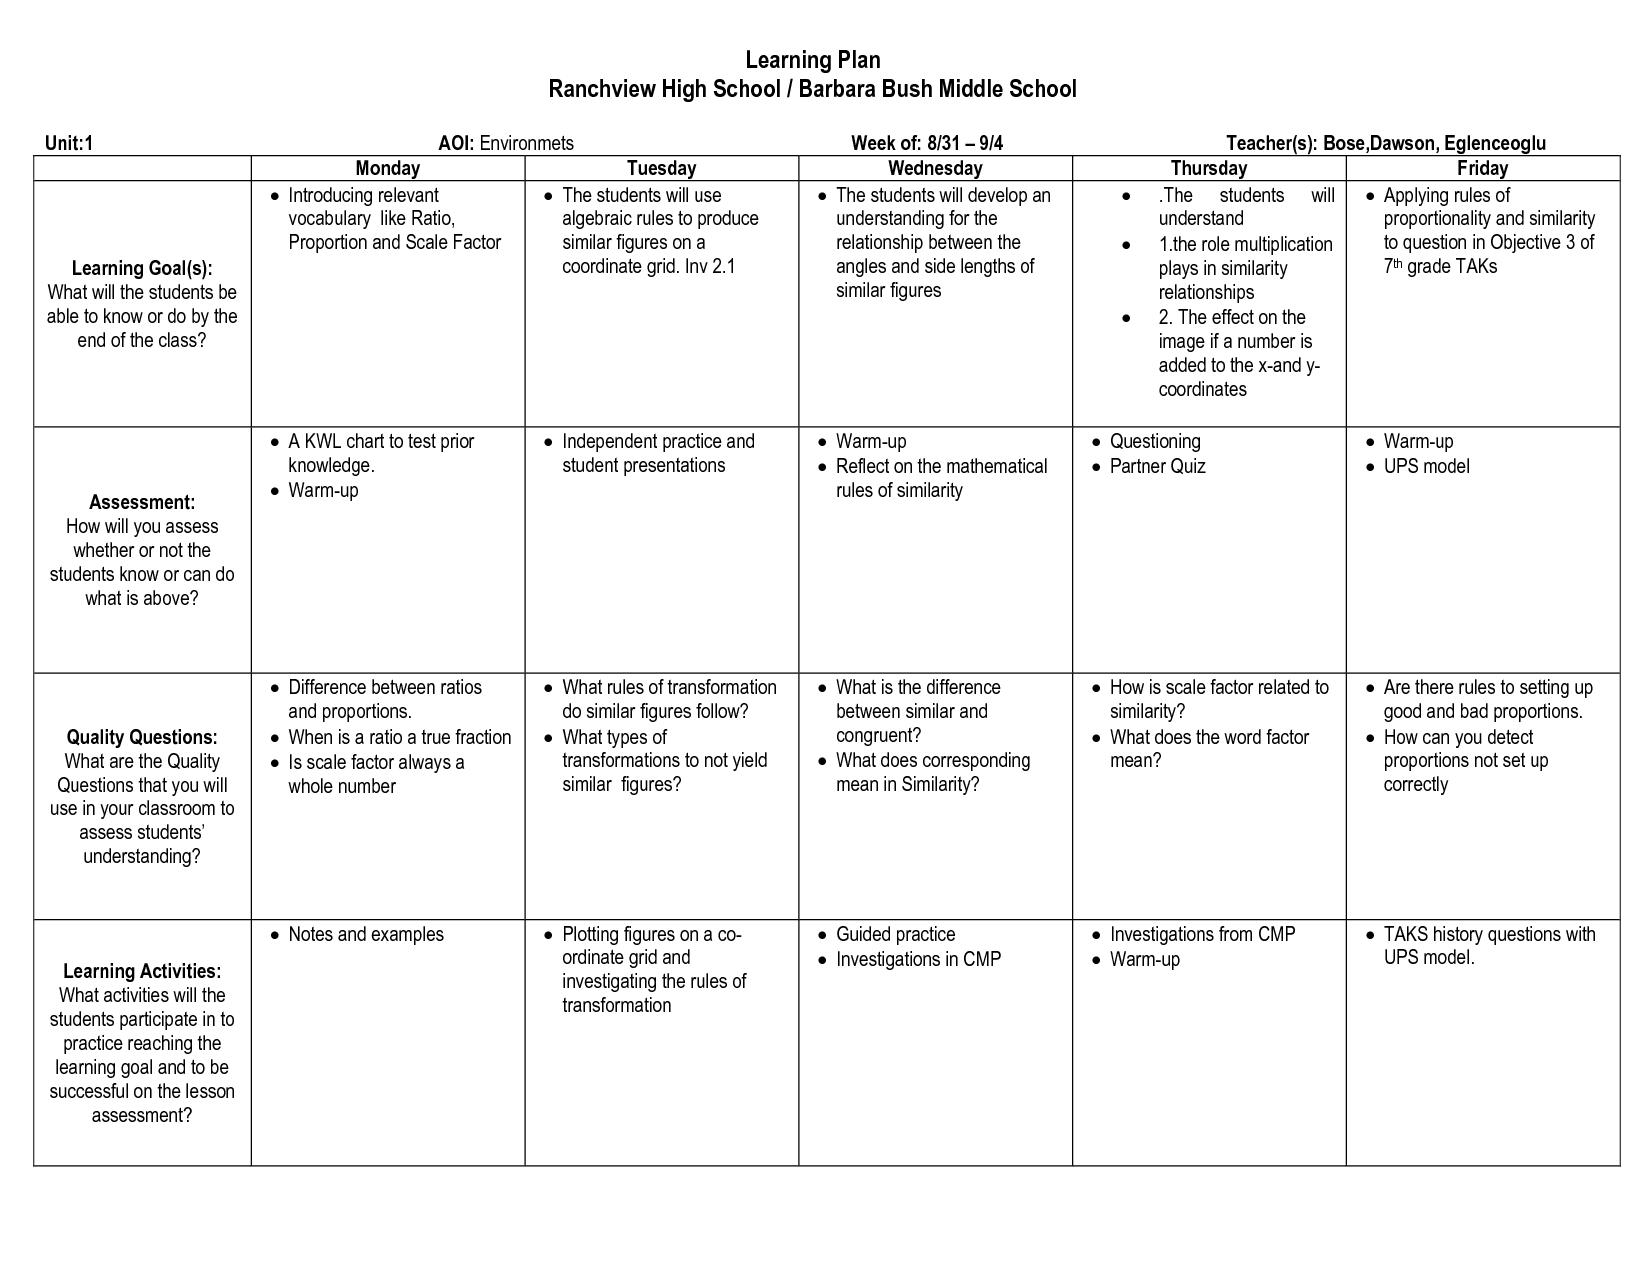 Learning Plans Or Goals For Teachers